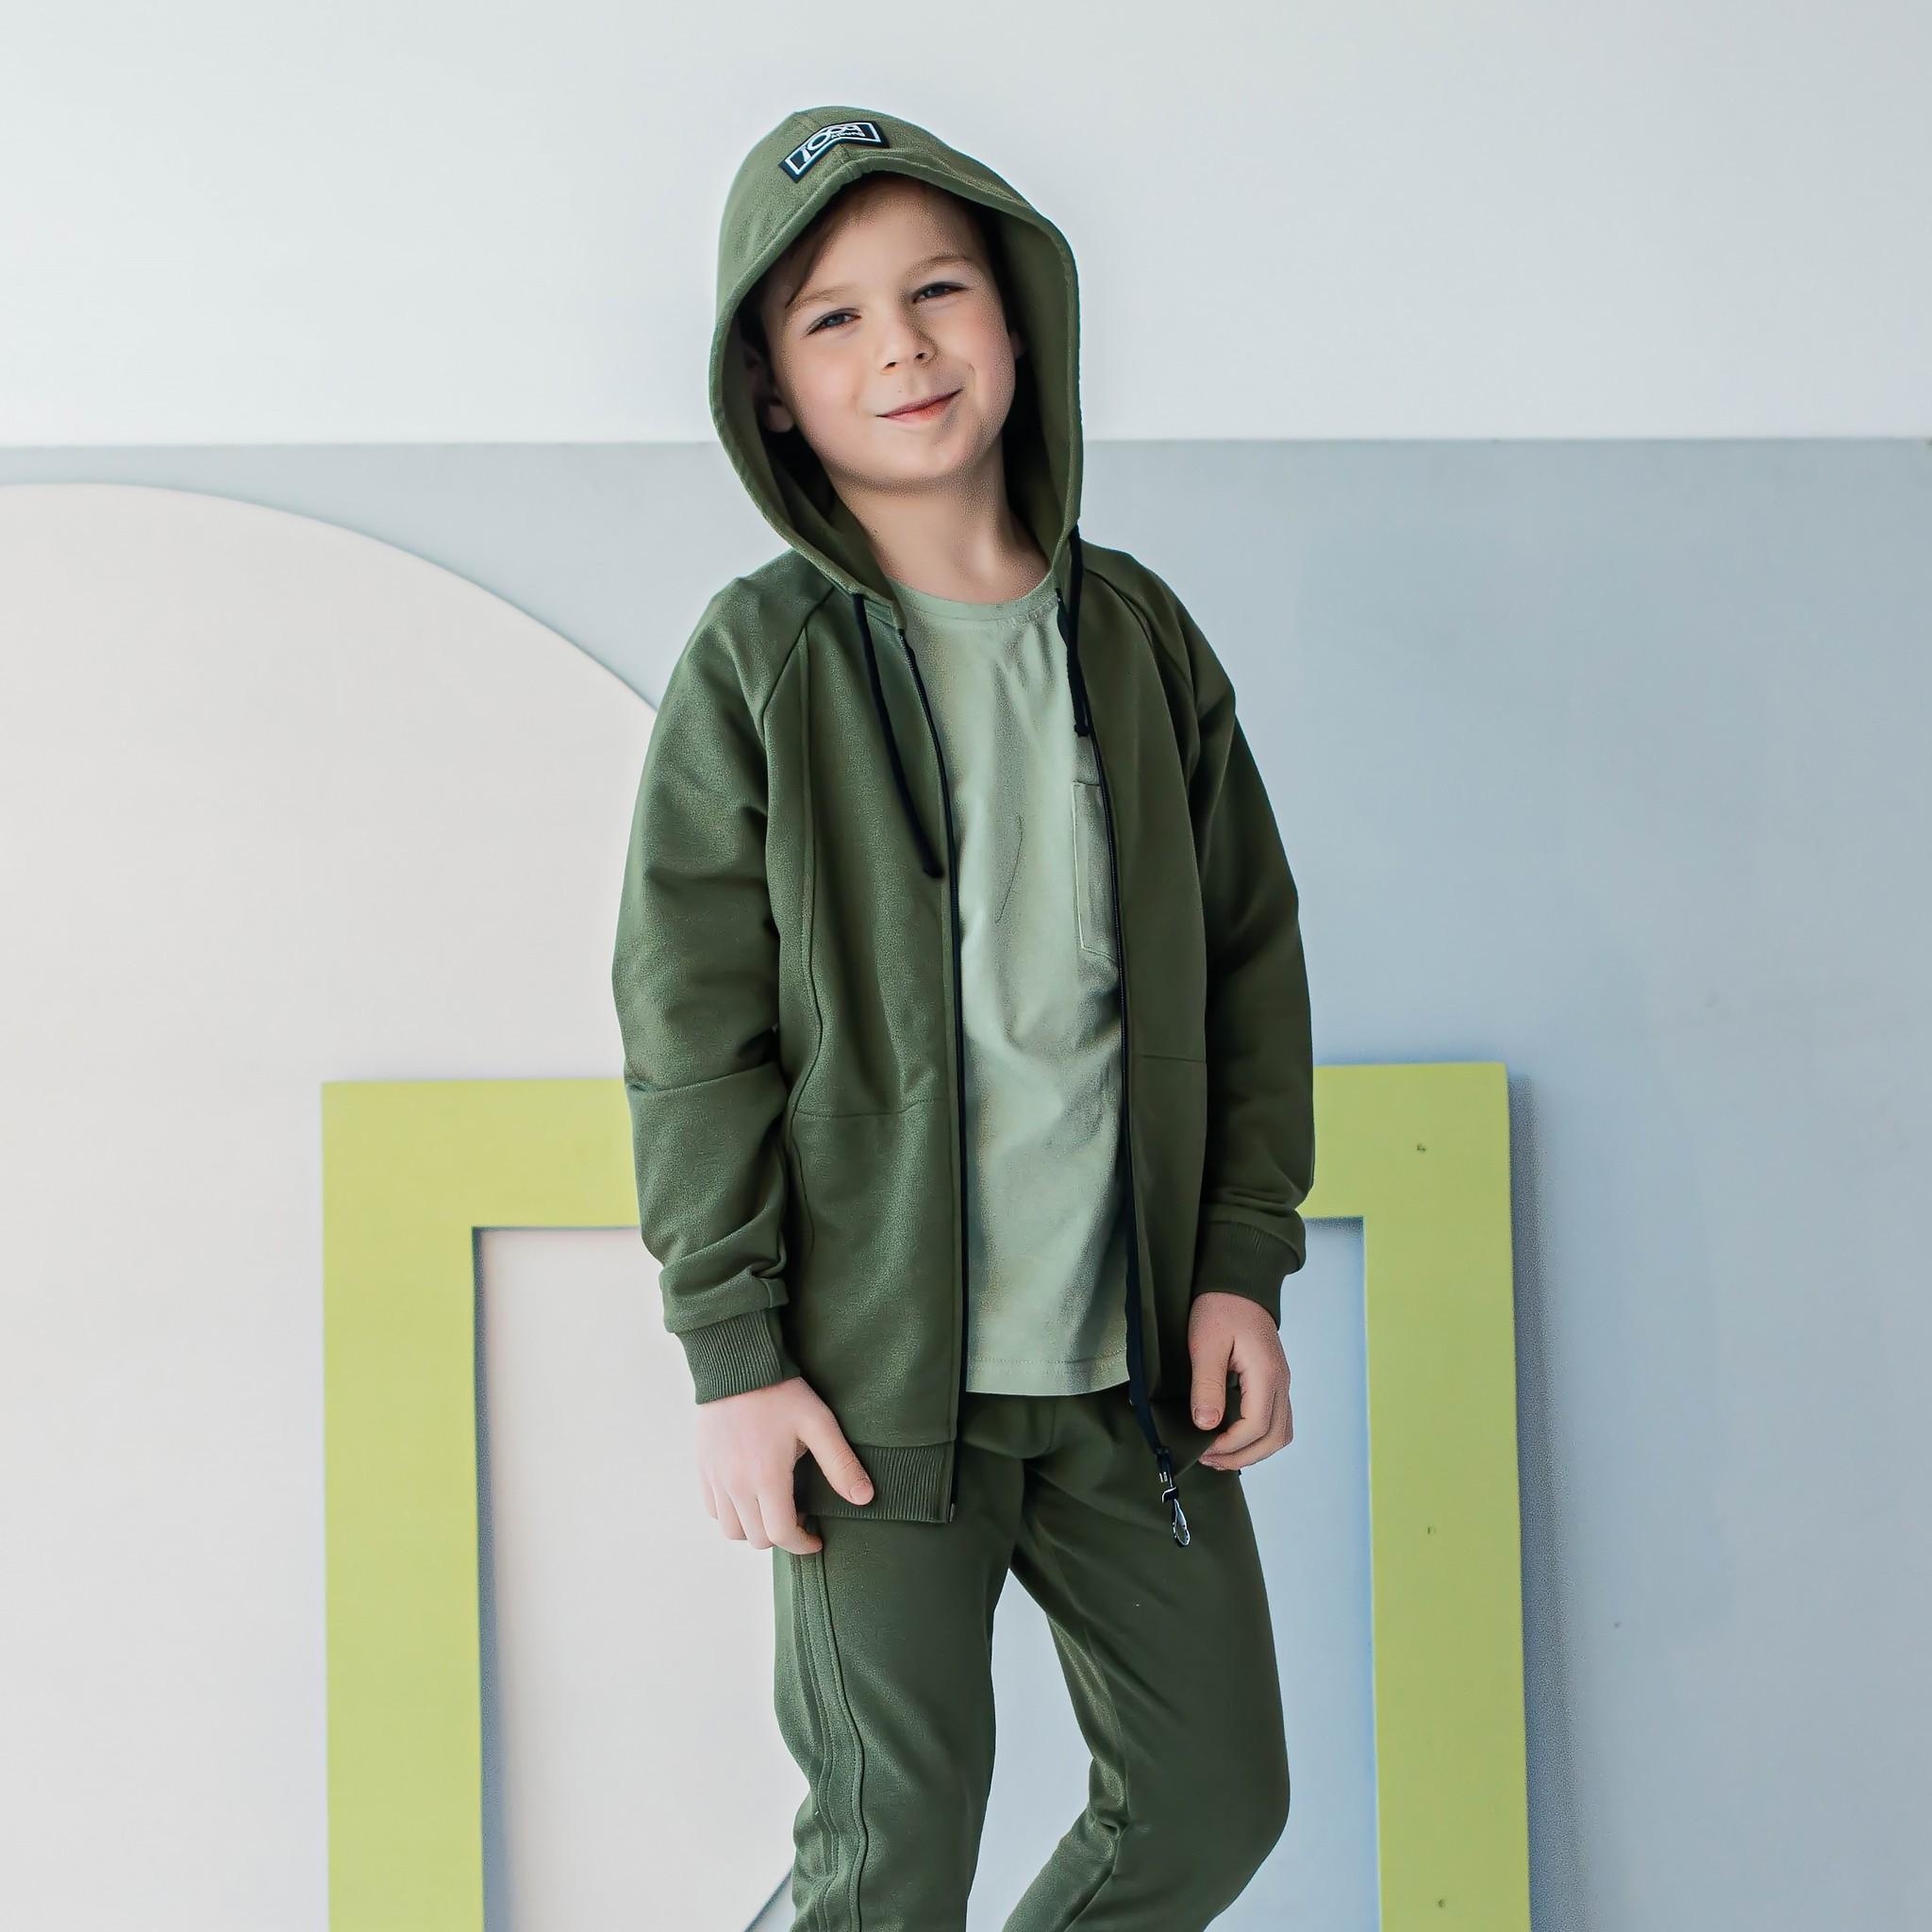 Hoodie for teens - Military